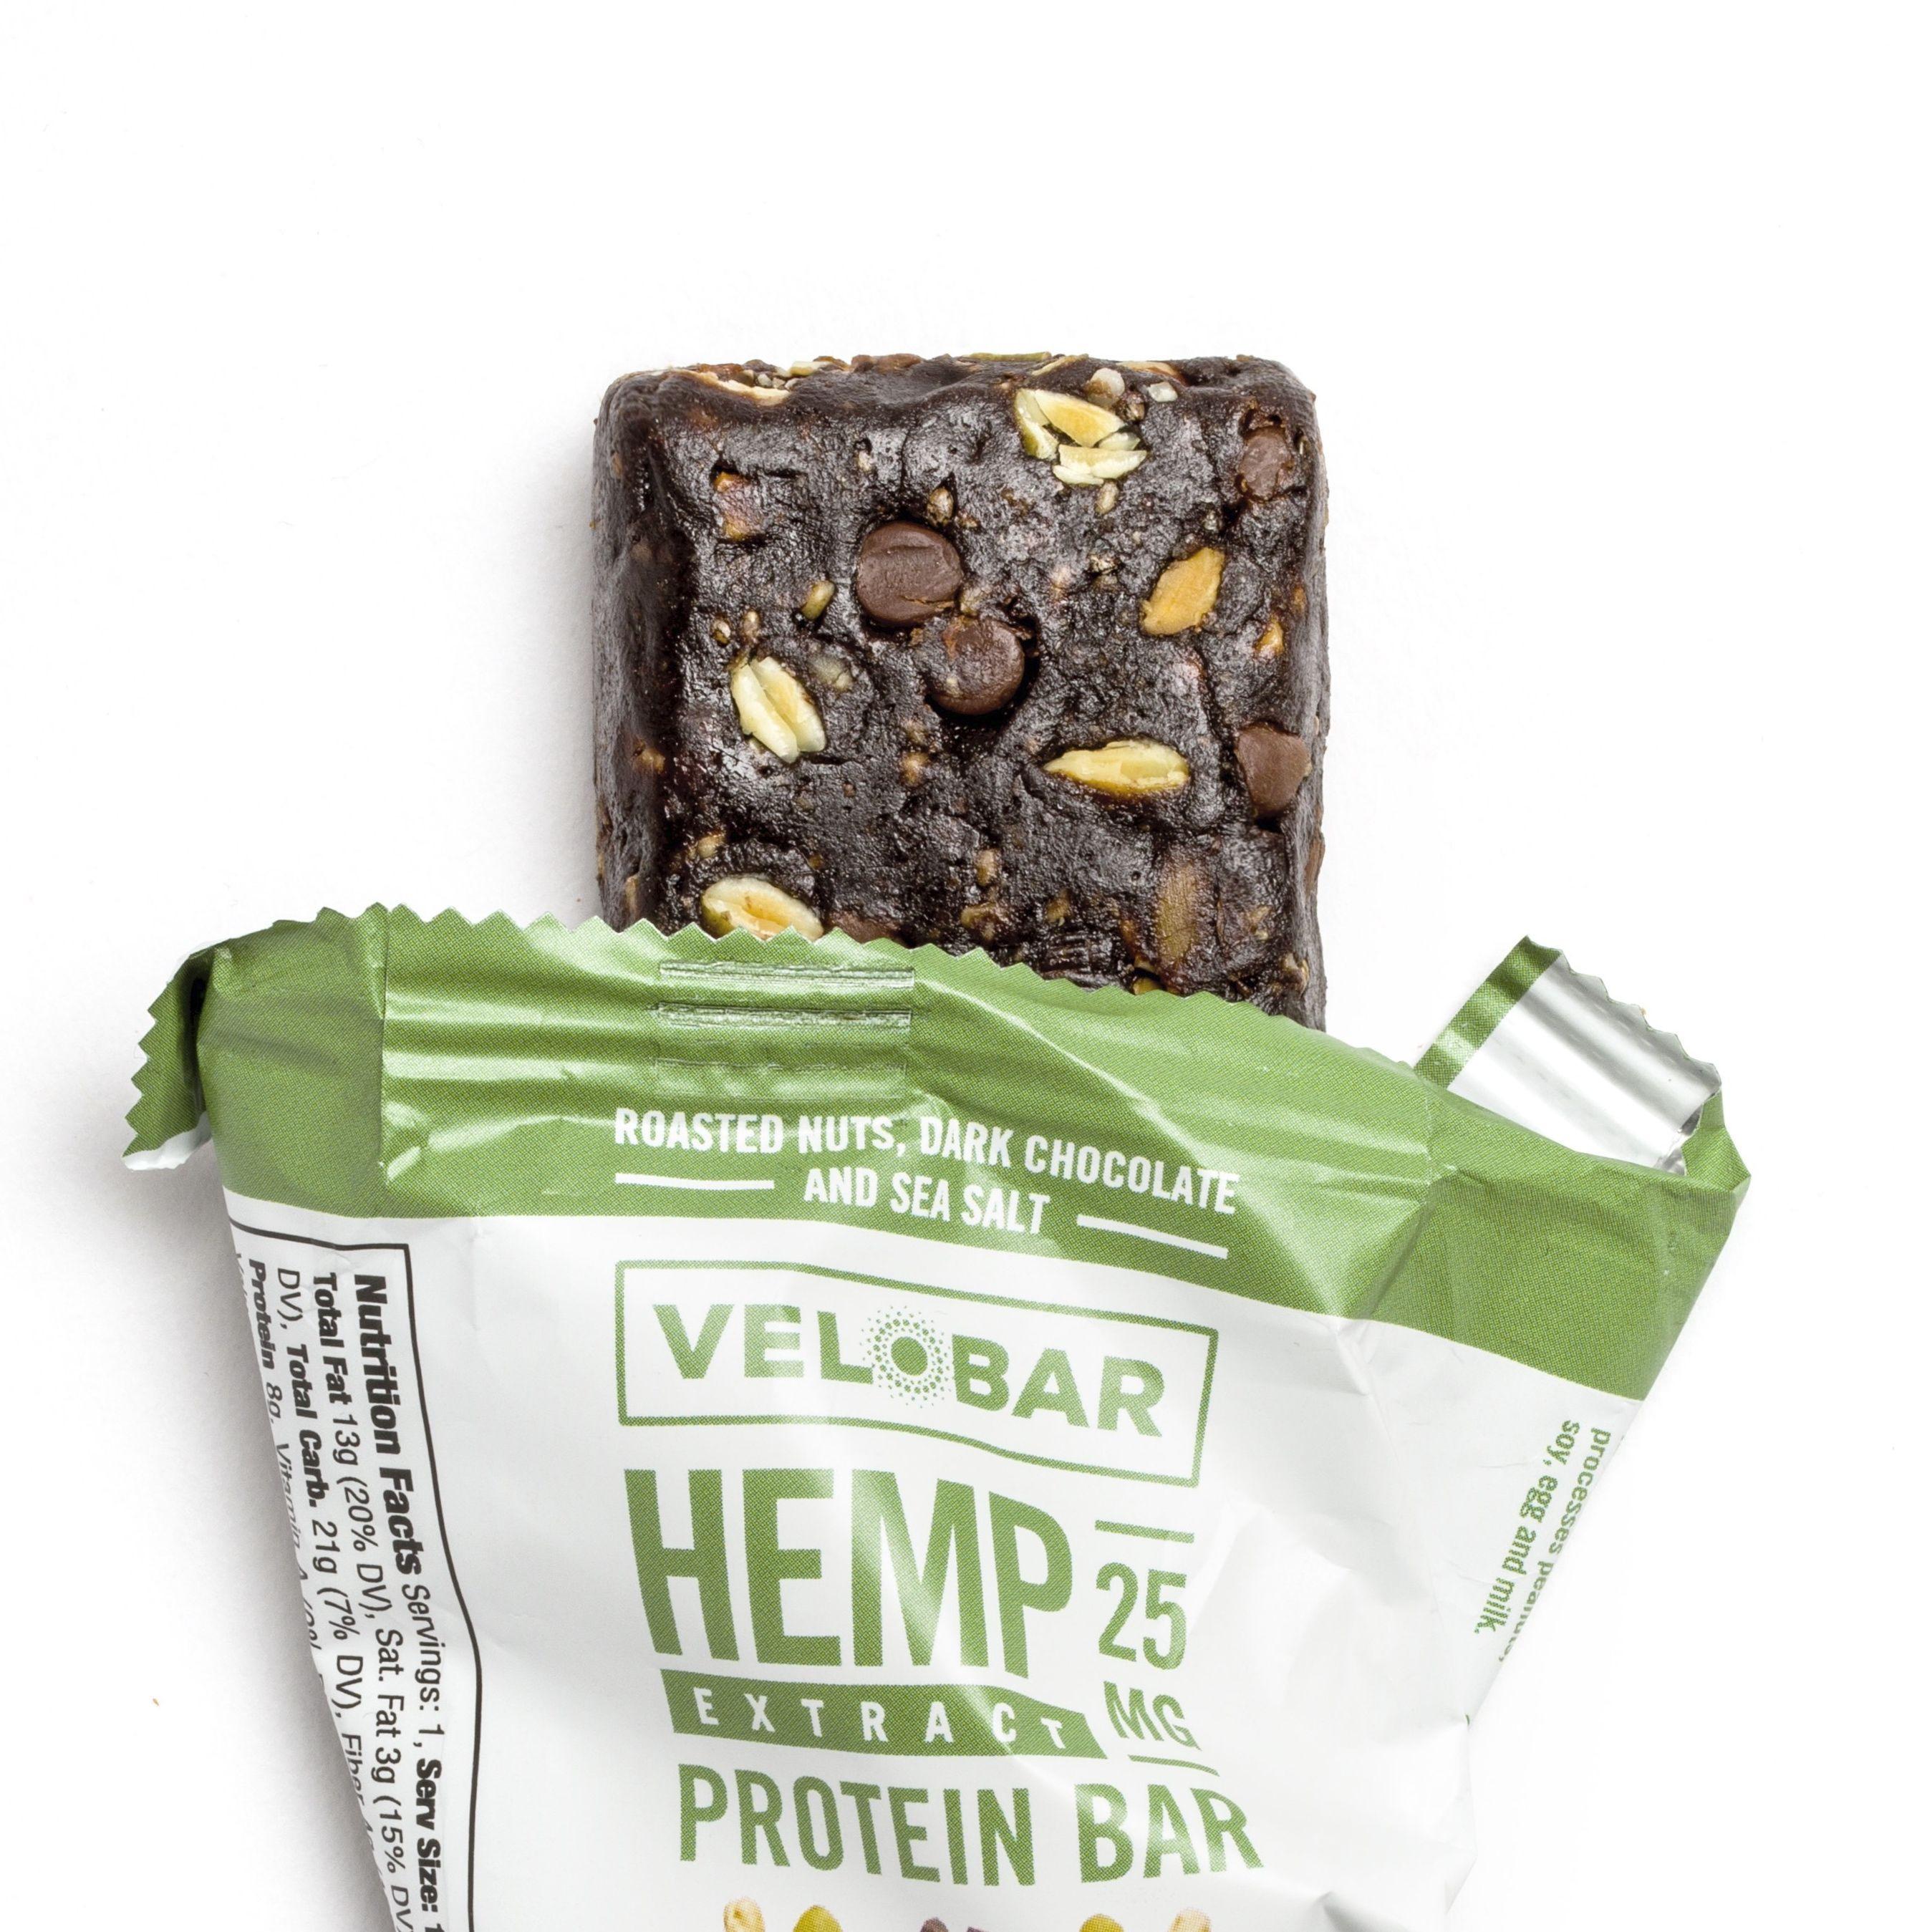 Velobar Hemp Extract Protein Bar / Chocolate flavor